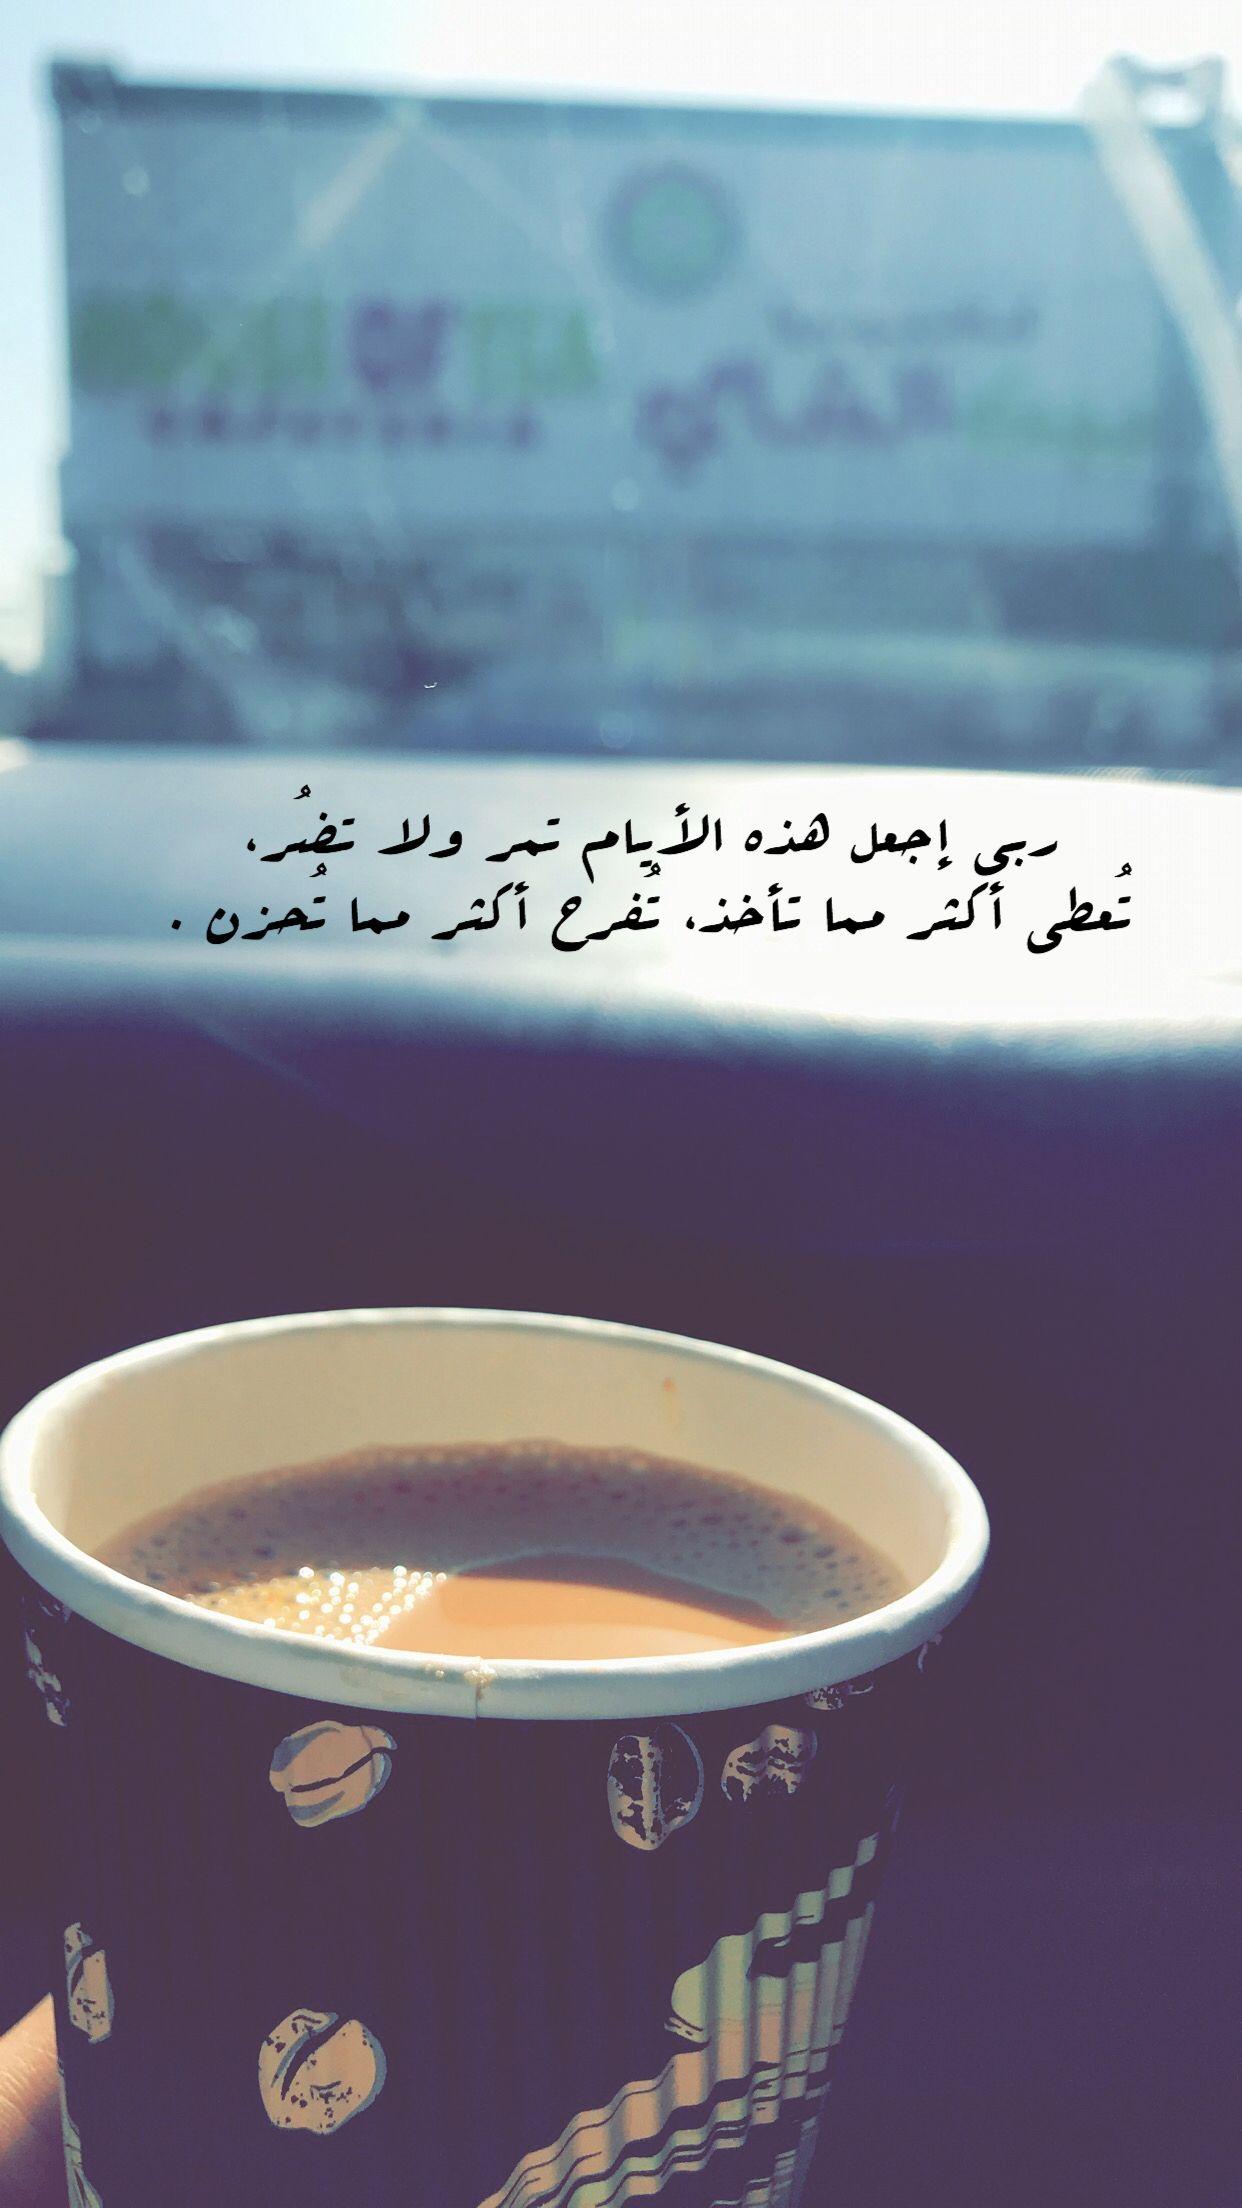 Pin By Positive Aisha On Islam Instagram Account Ideas Insta Photo Ideas Instagram Editing